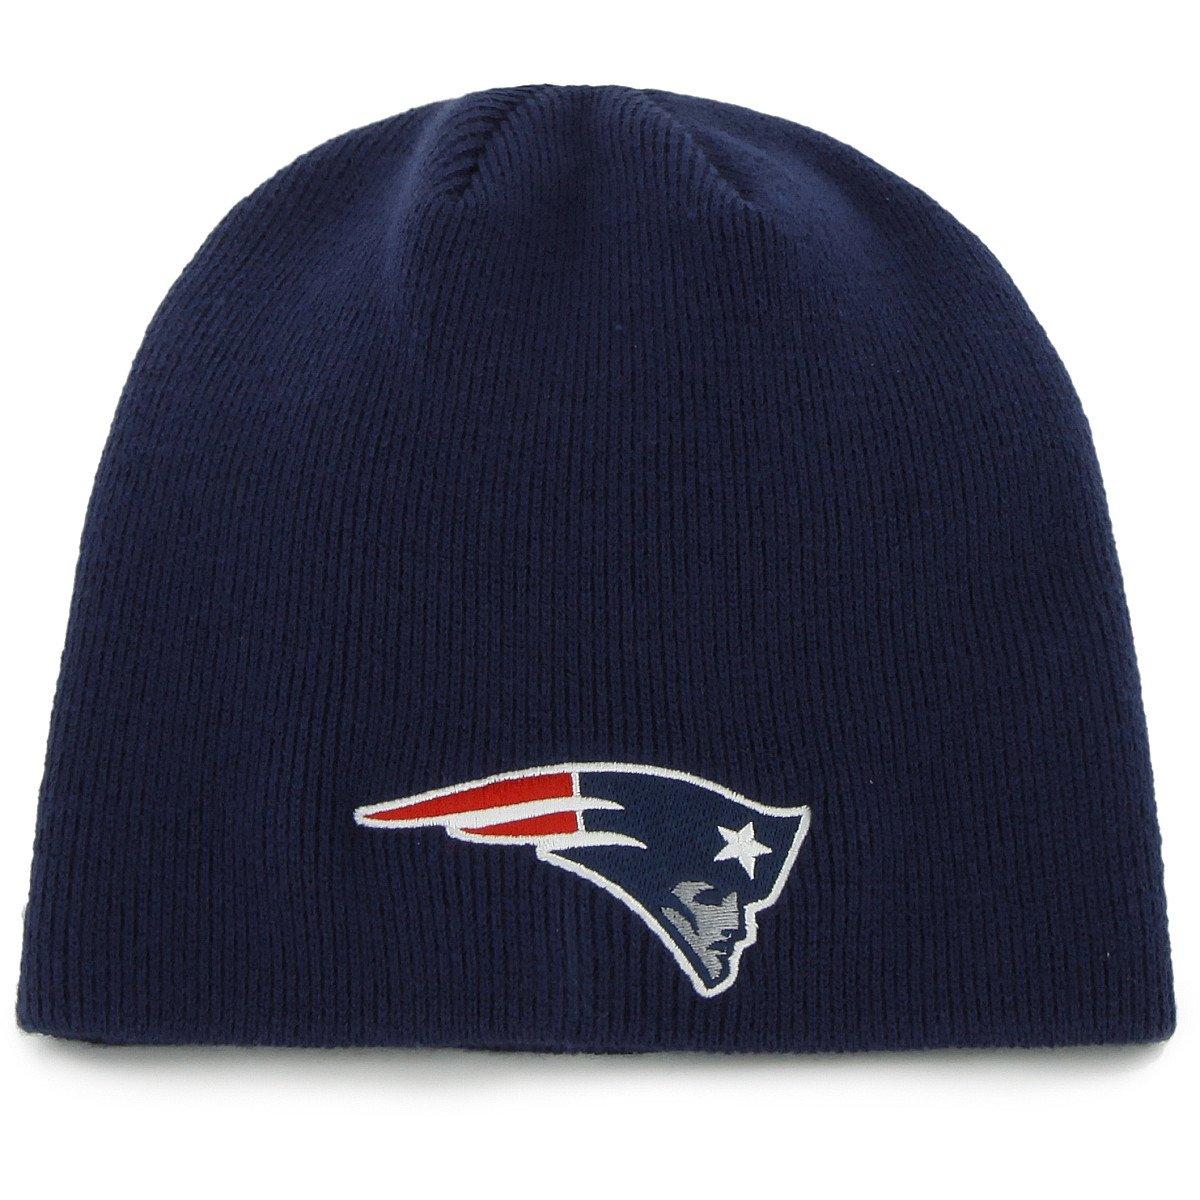 NFL Adult Mens Beanie Knit Hat